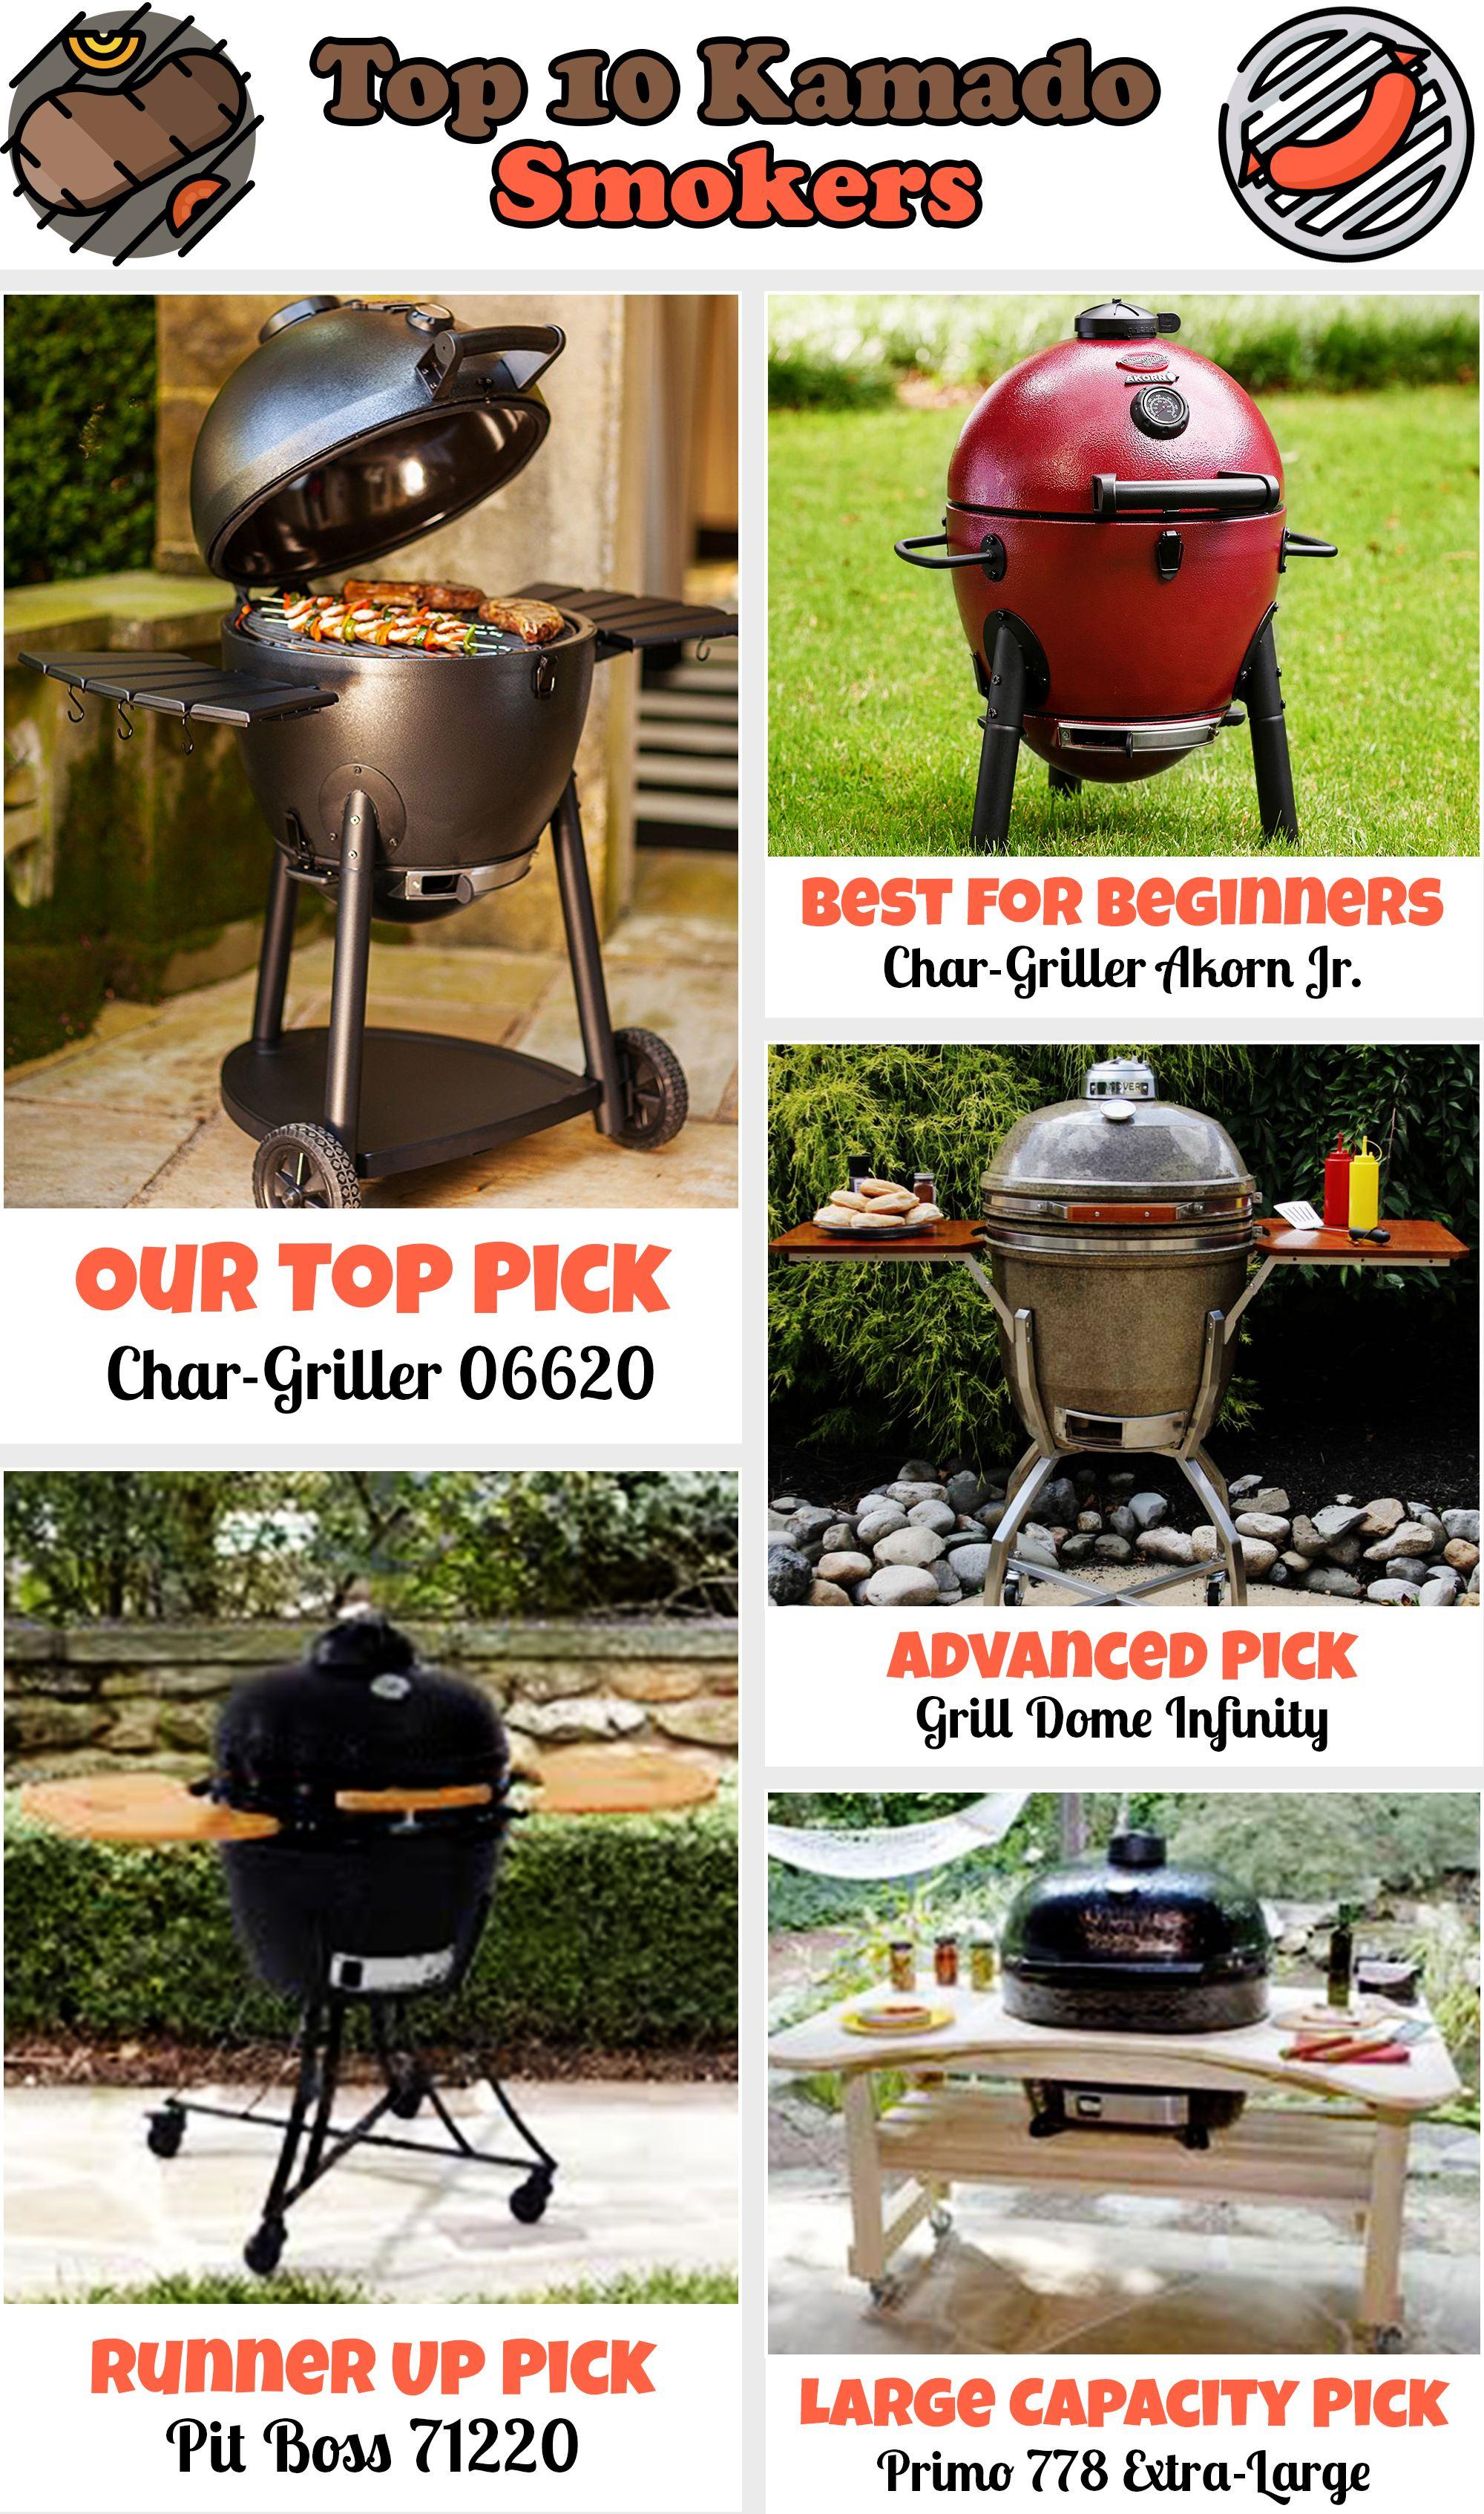 Top 10 Kamado Smokers Feb 2020 Reviews Buyers Guide Kamado Grilling Best Kamado Grill